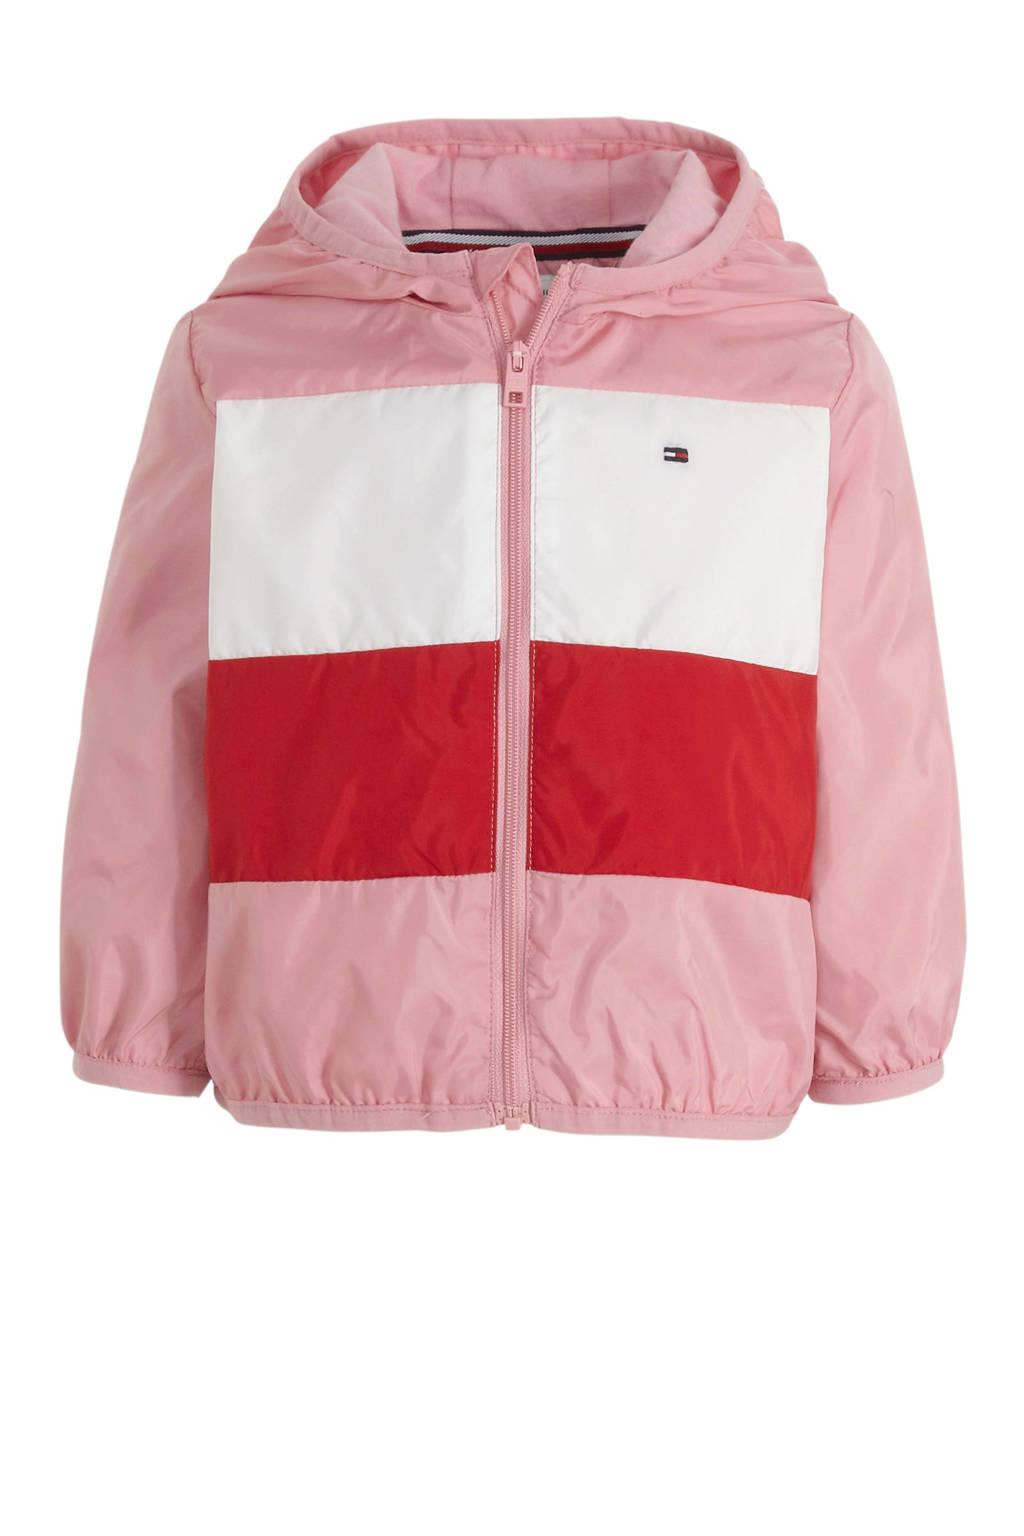 Tommy Hilfiger zomerjas met logo lichtroze/wit/rood, Lichtroze/wit/rood